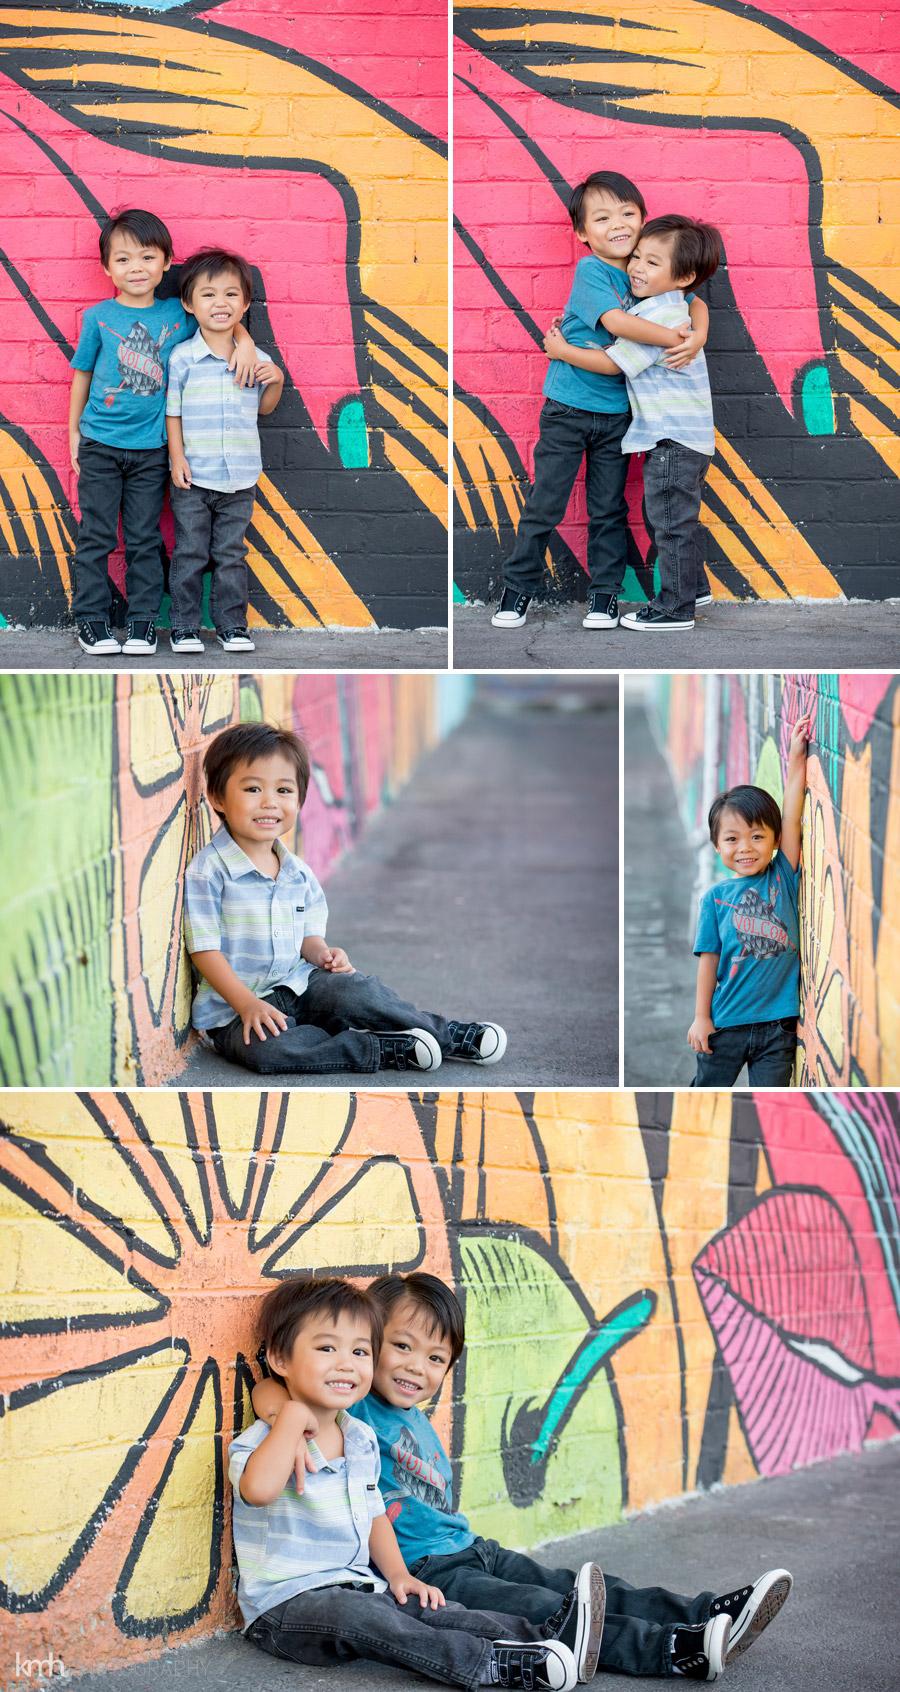 kmh-downtown-las-vegas-family-photography-1115-1